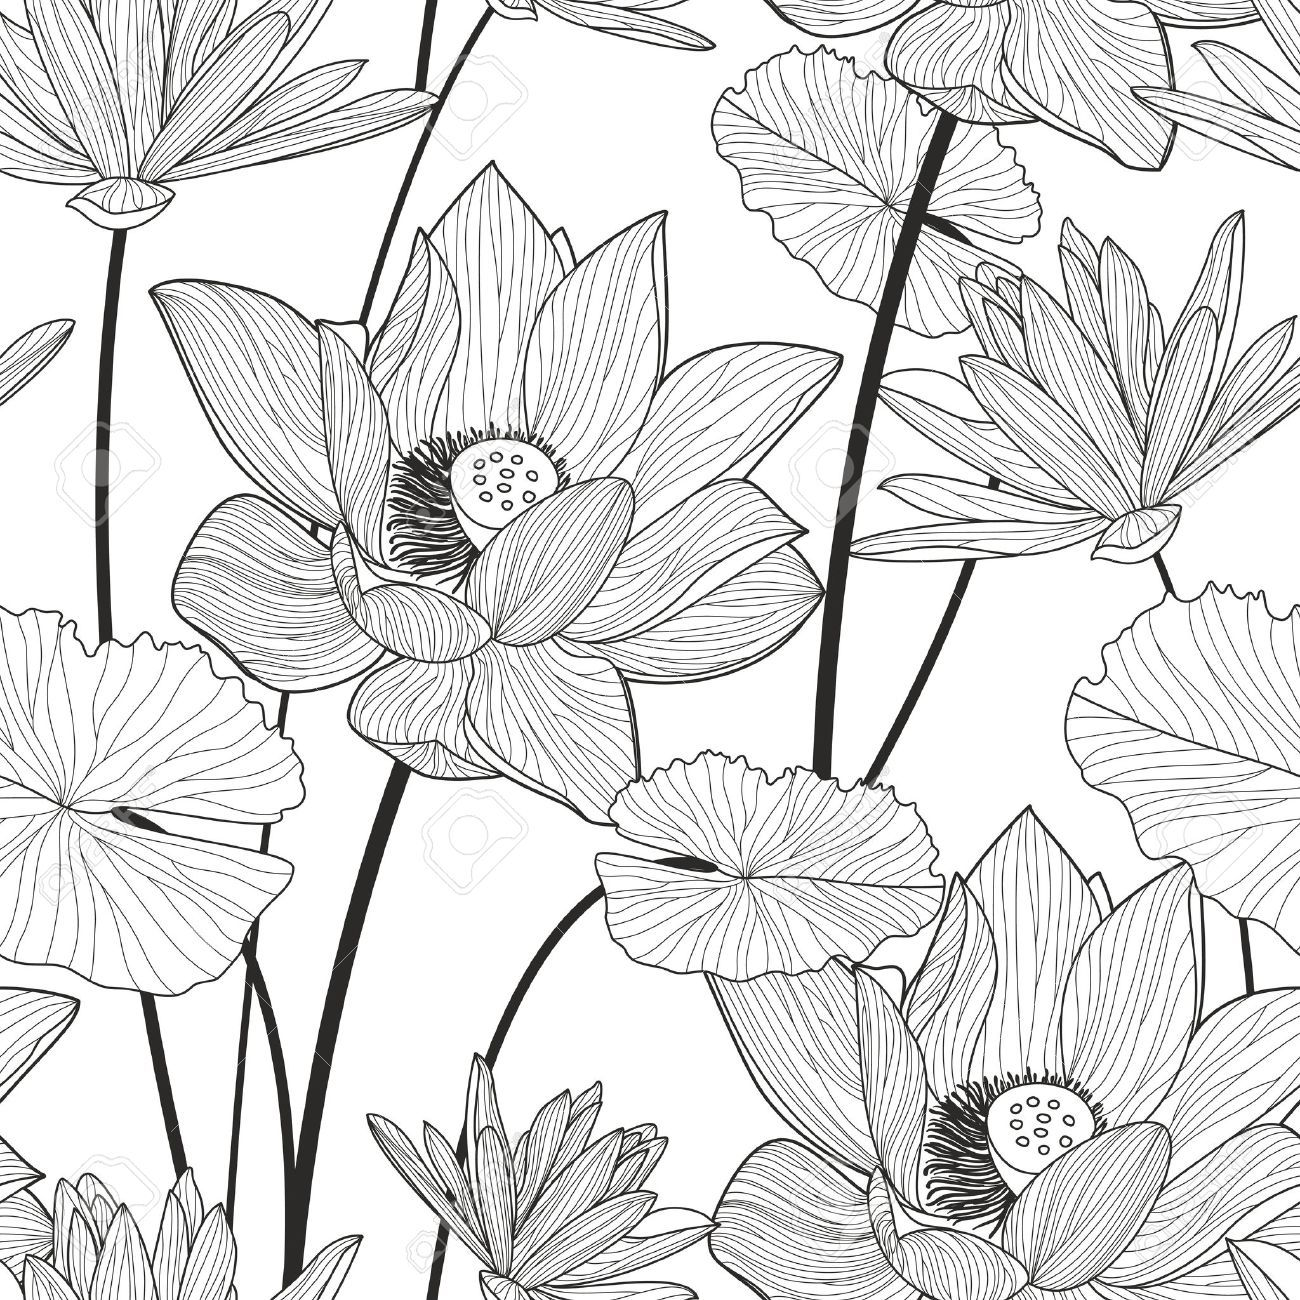 Stock Vector in 2020 Lotus art, Lotus flower art, Plant